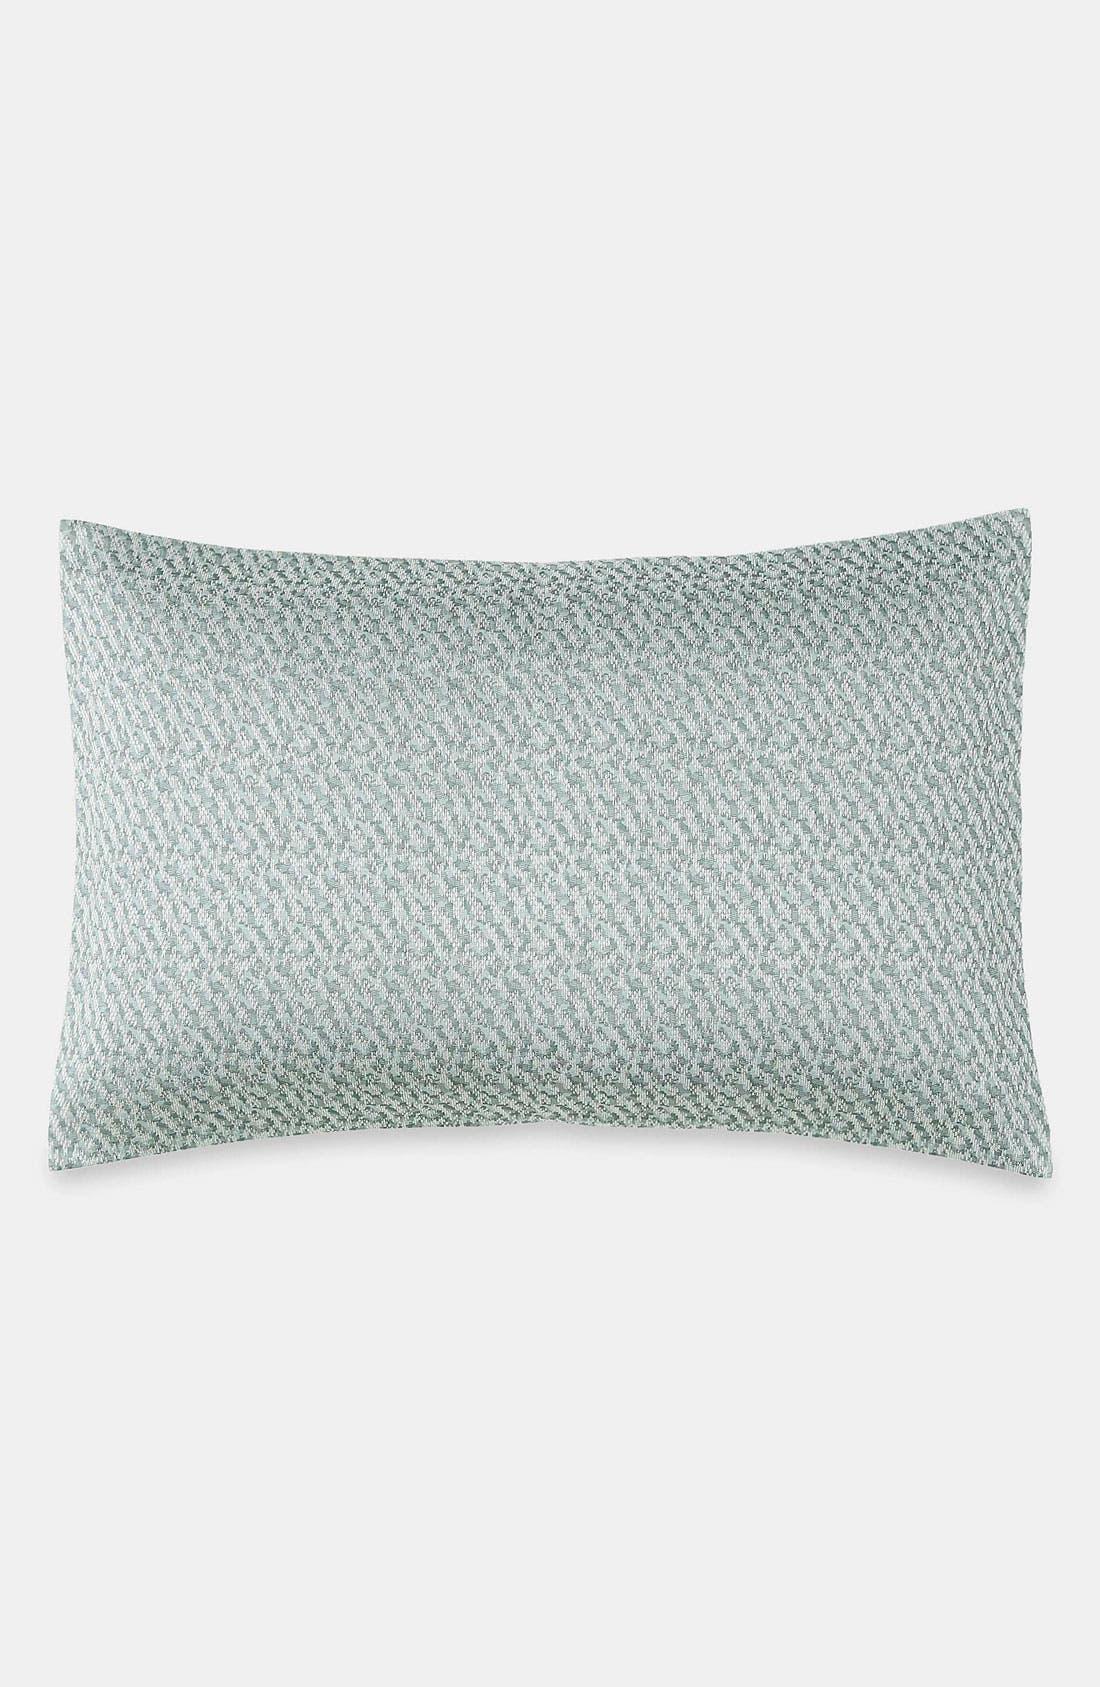 Main Image - DKNY 'Urban Space' Jacquard Pillow Sham